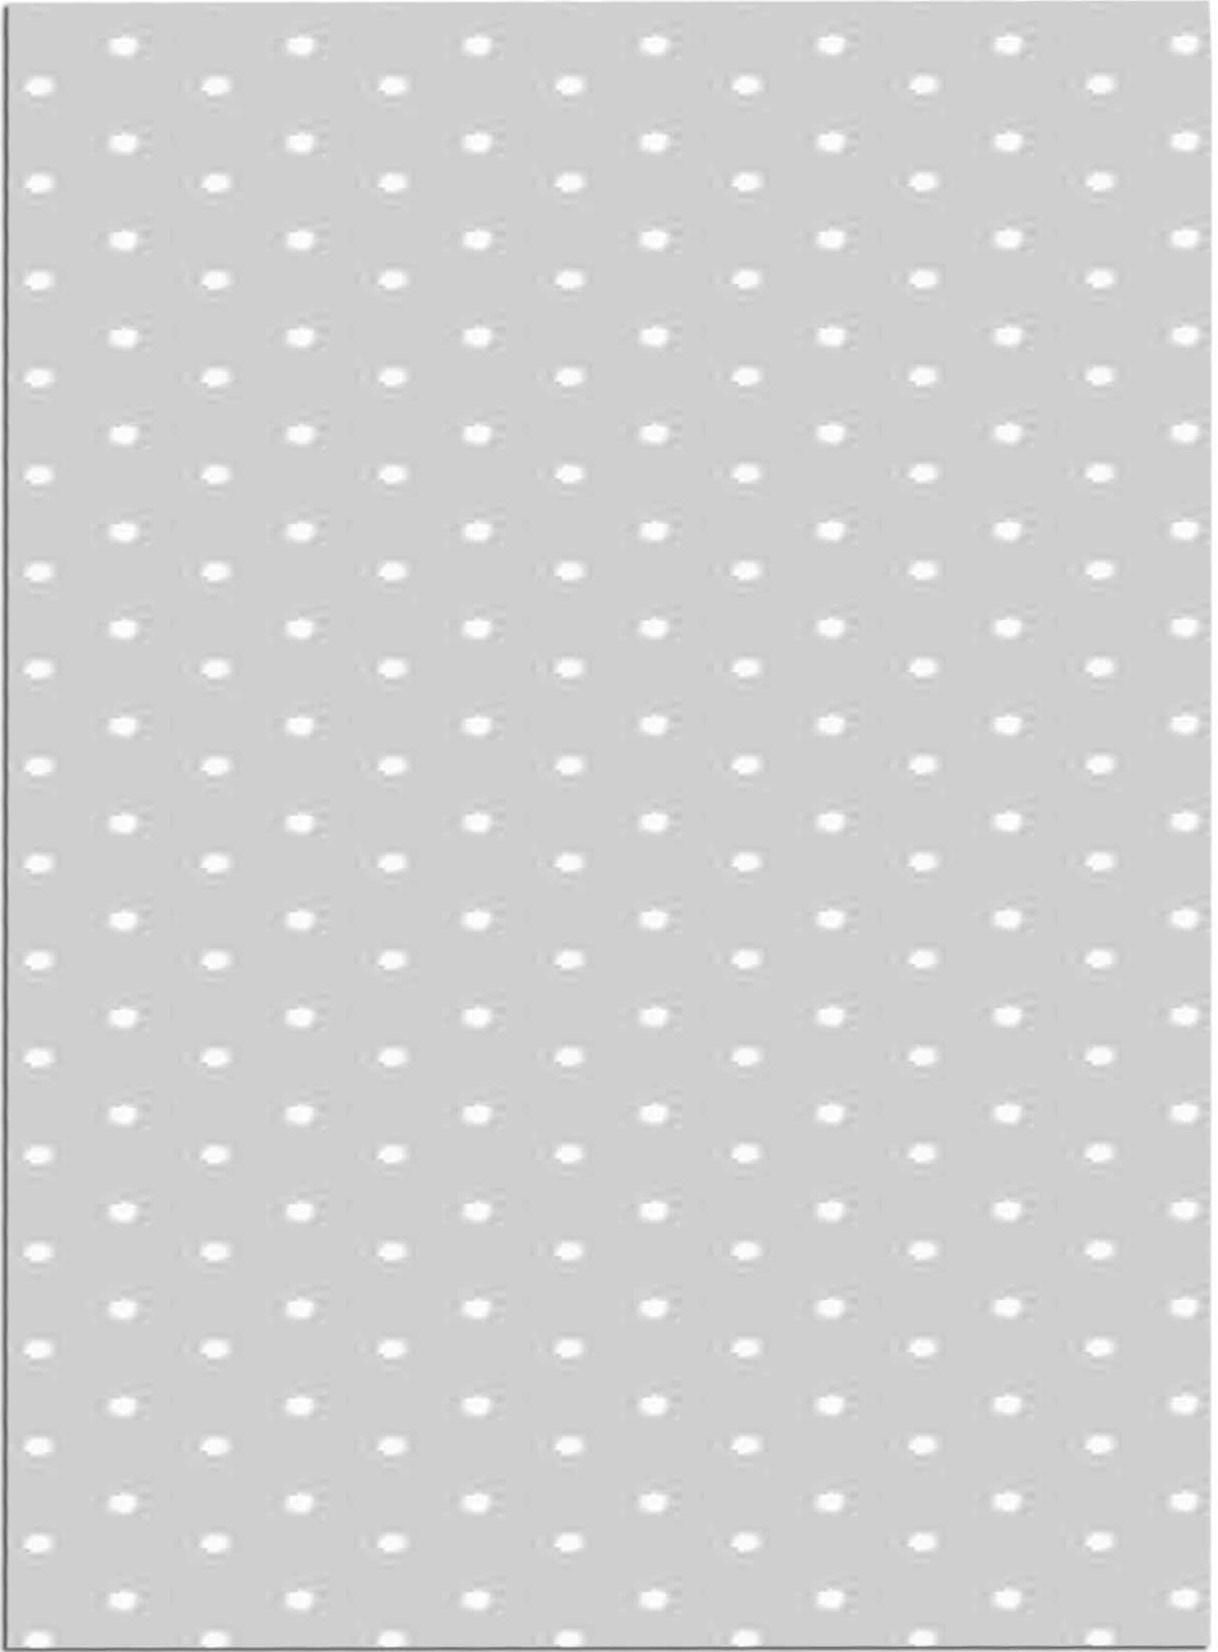 41044 Bolsa 25X35 Puntos Blancos Image